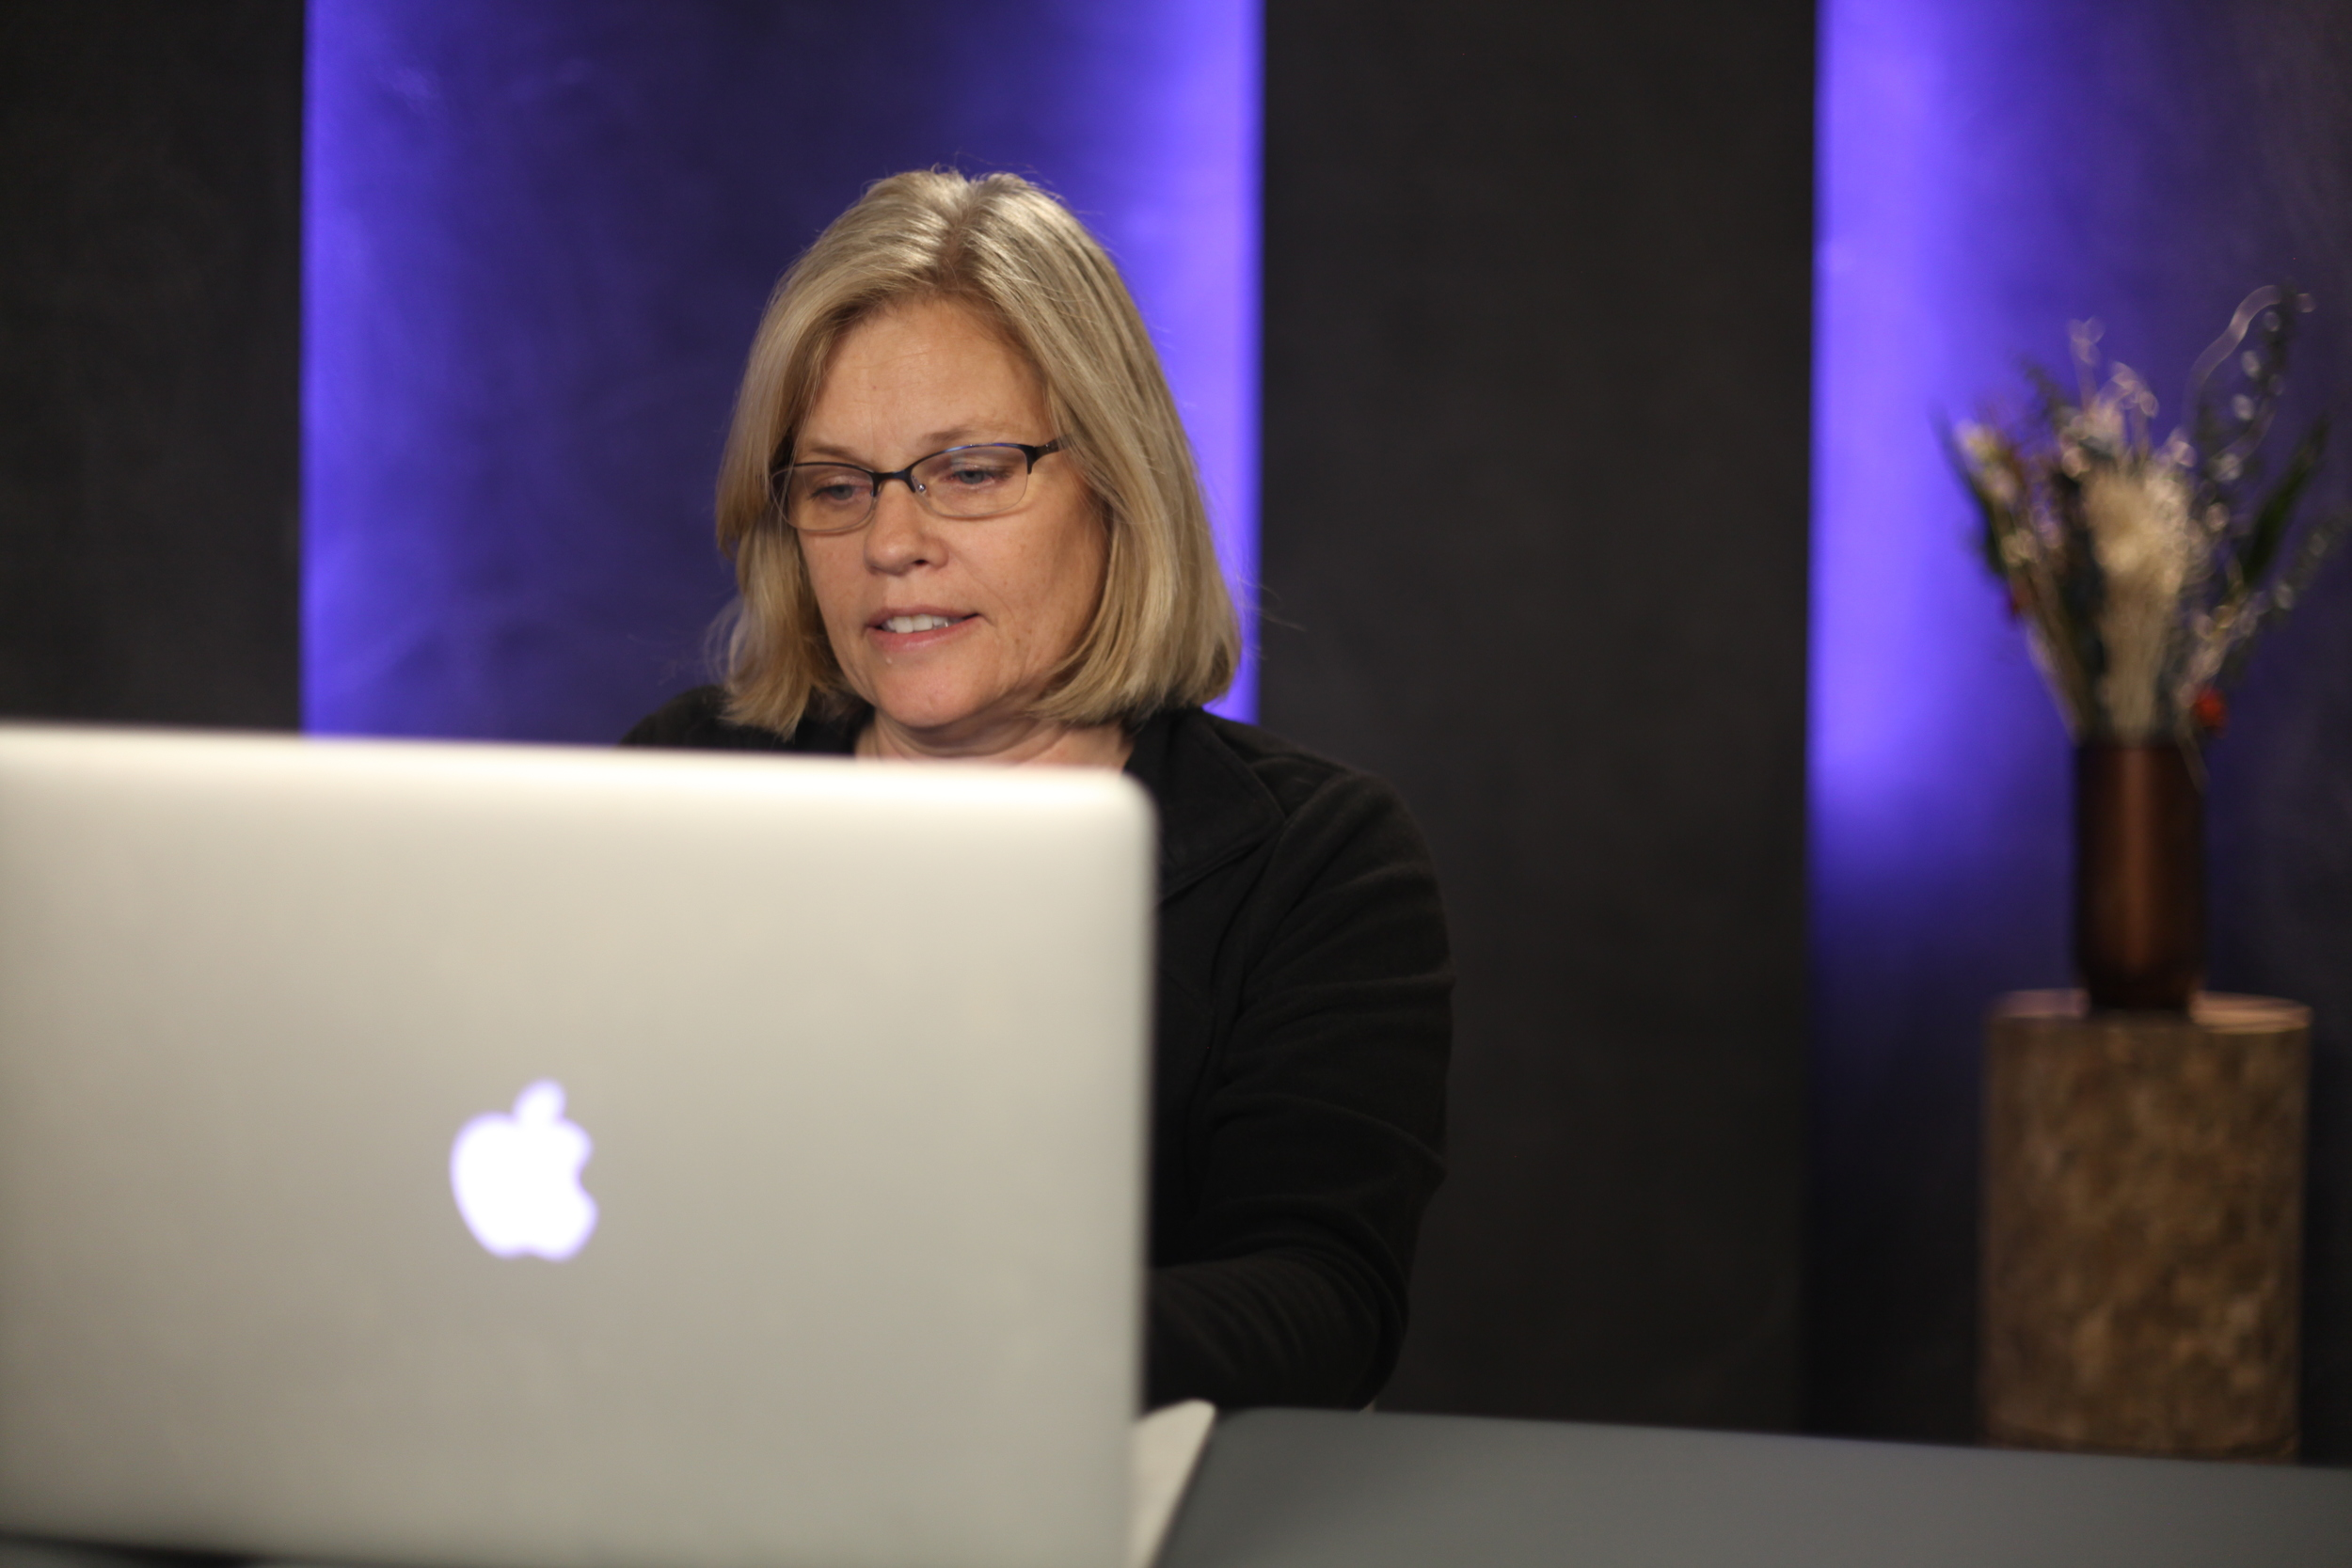 Debra conducting a live online training.